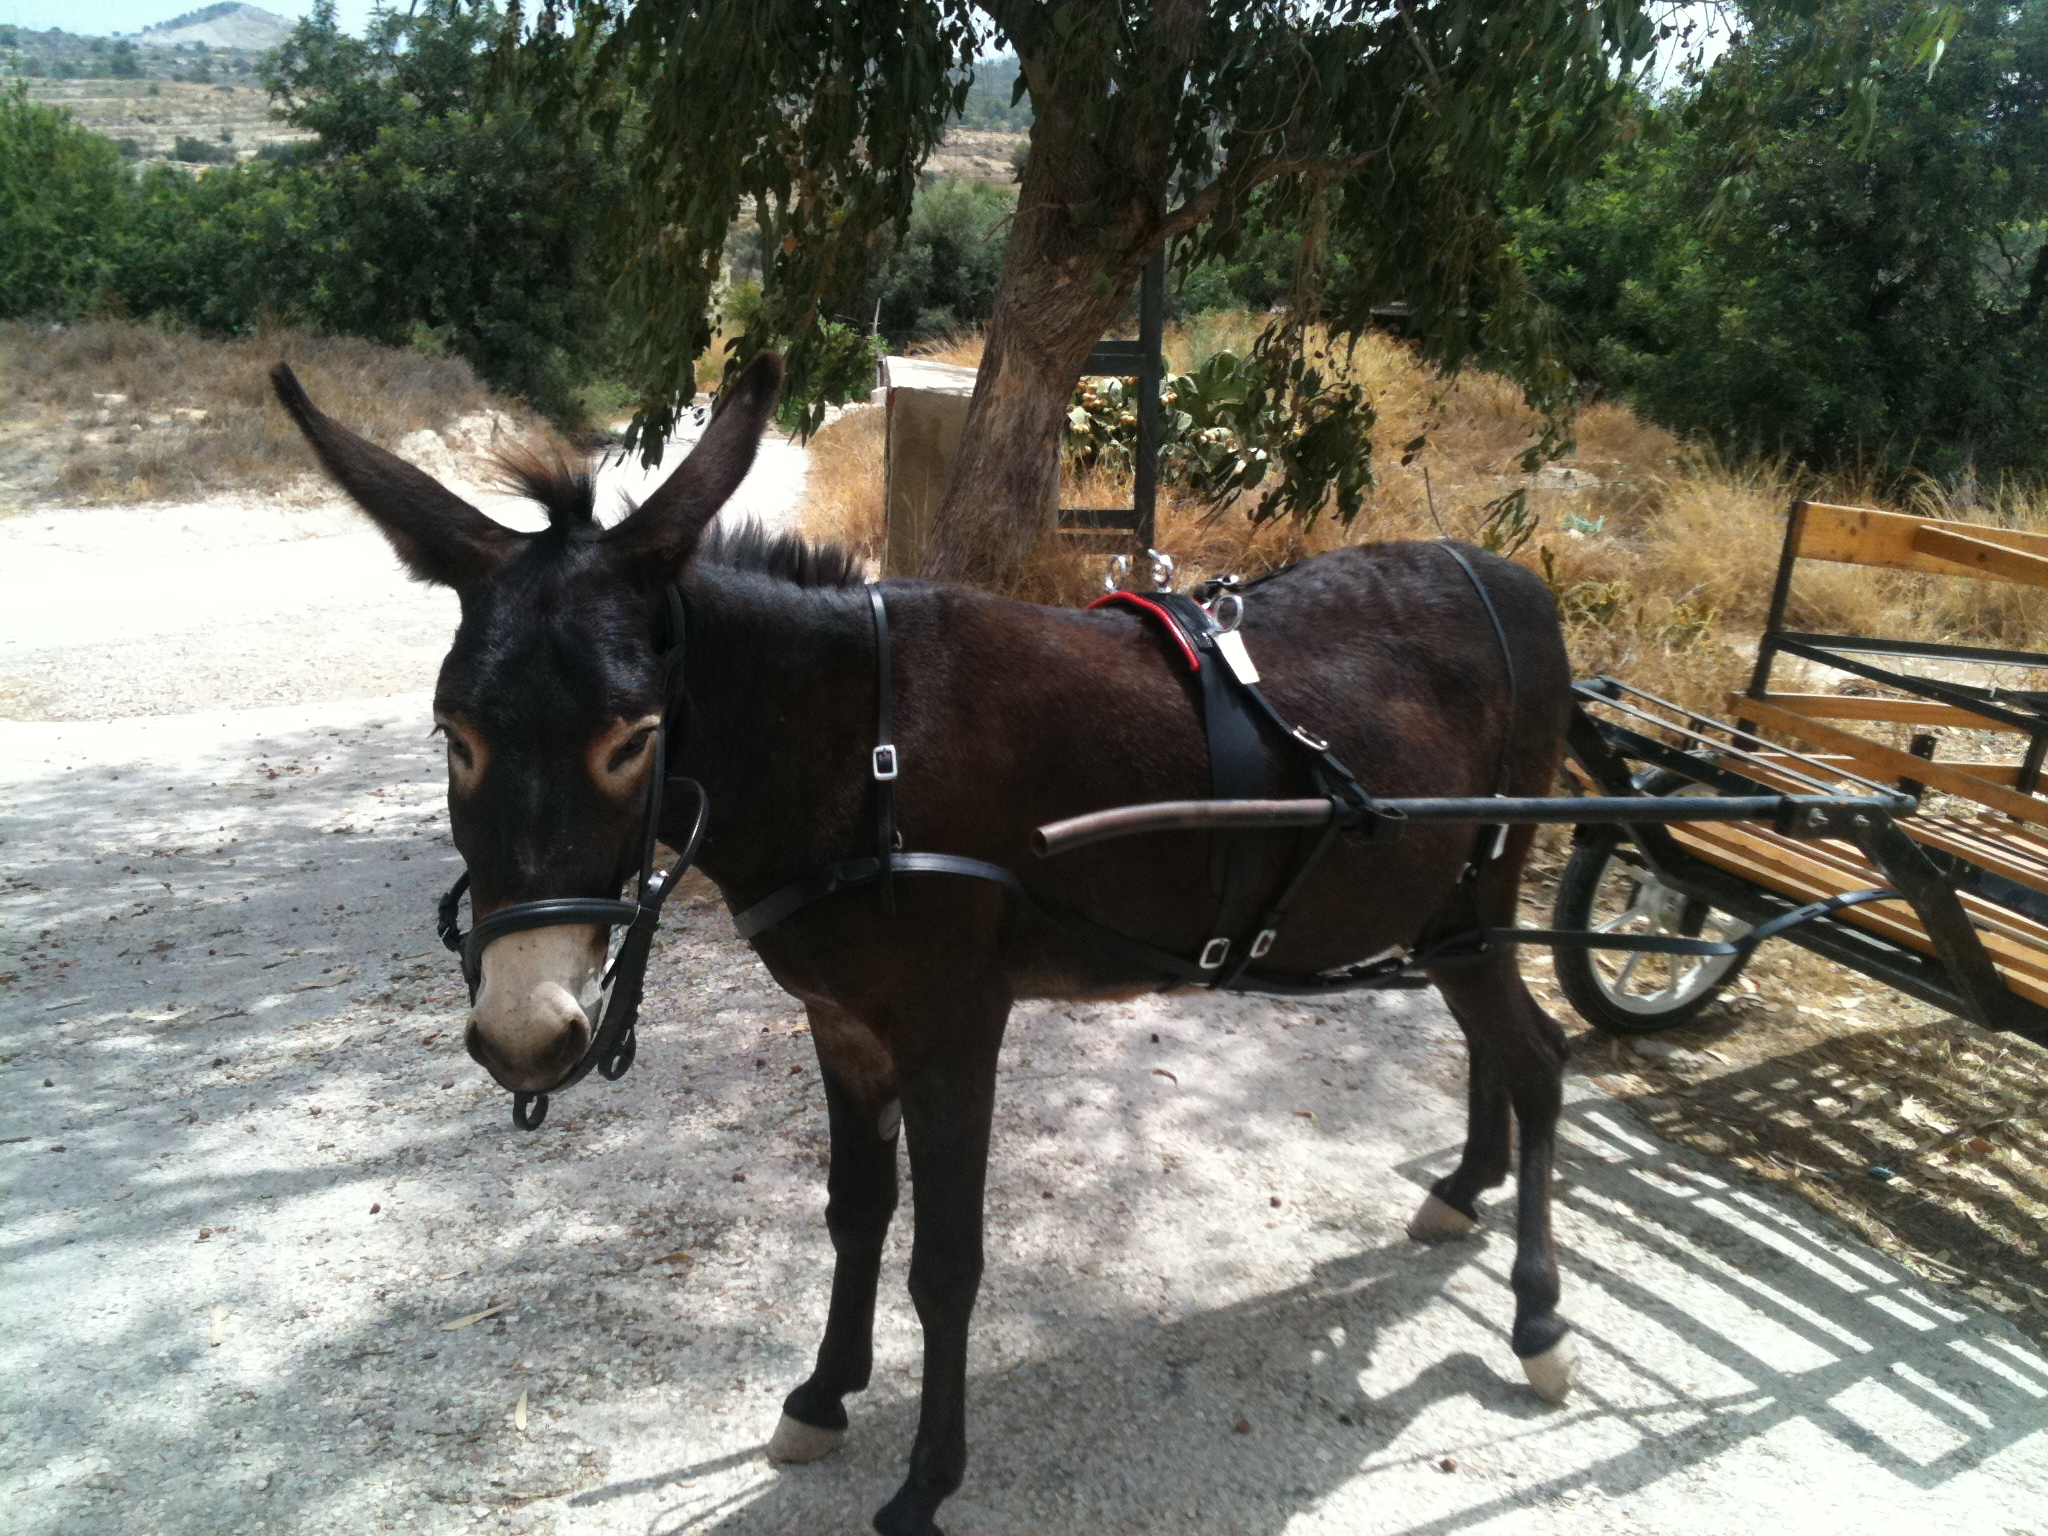 Donkey cart blues |